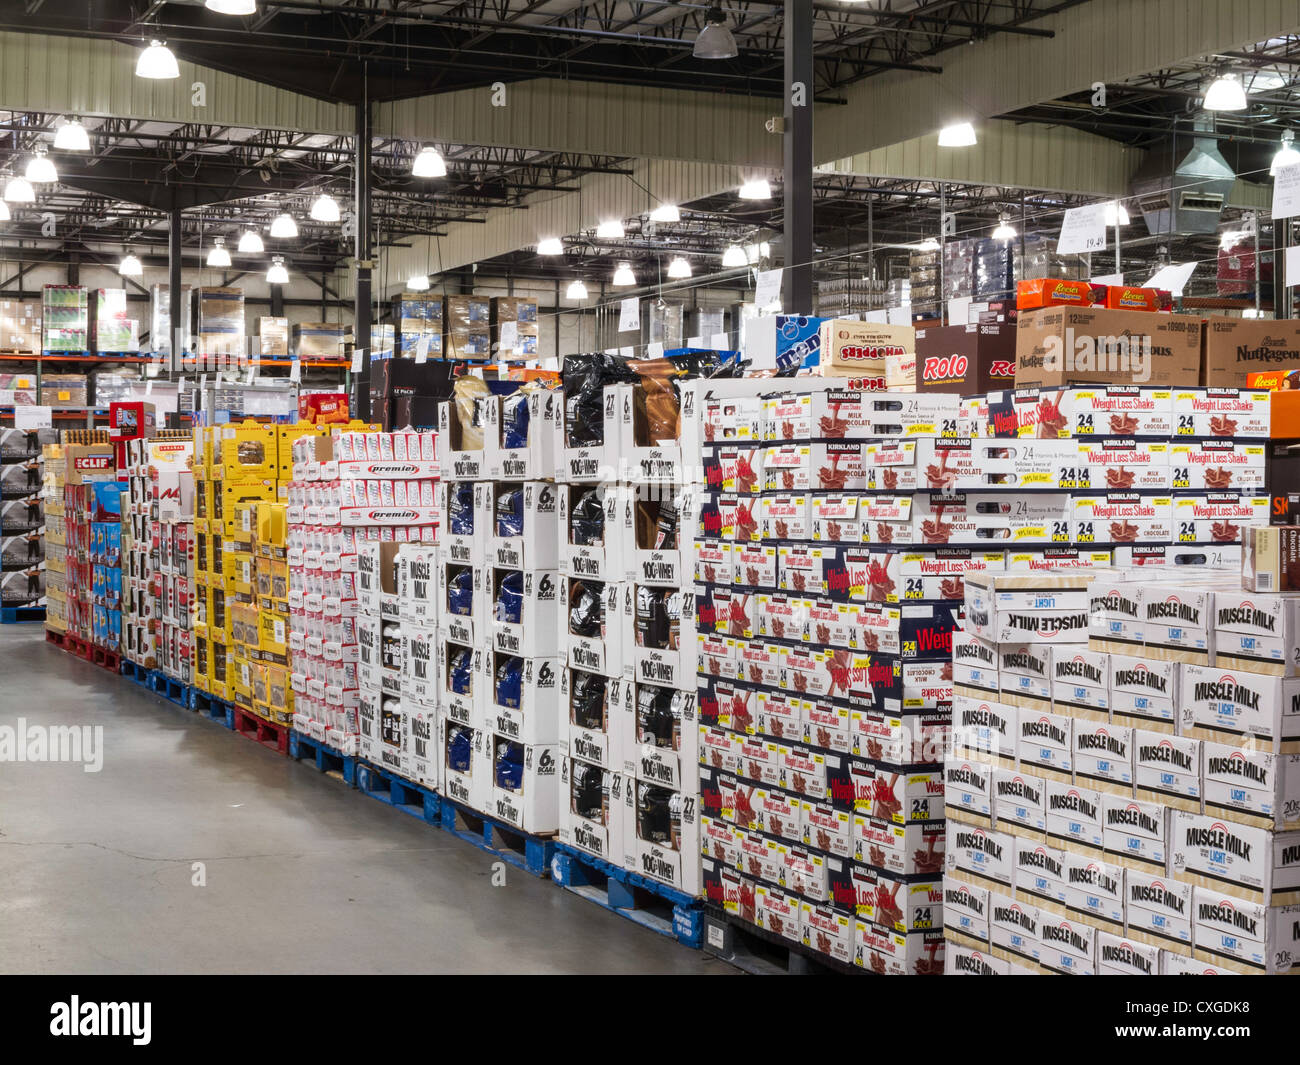 Costco Wholesale Warehouse Store Stock Photo: 50763756 - Alamy  Costco Wholesal...